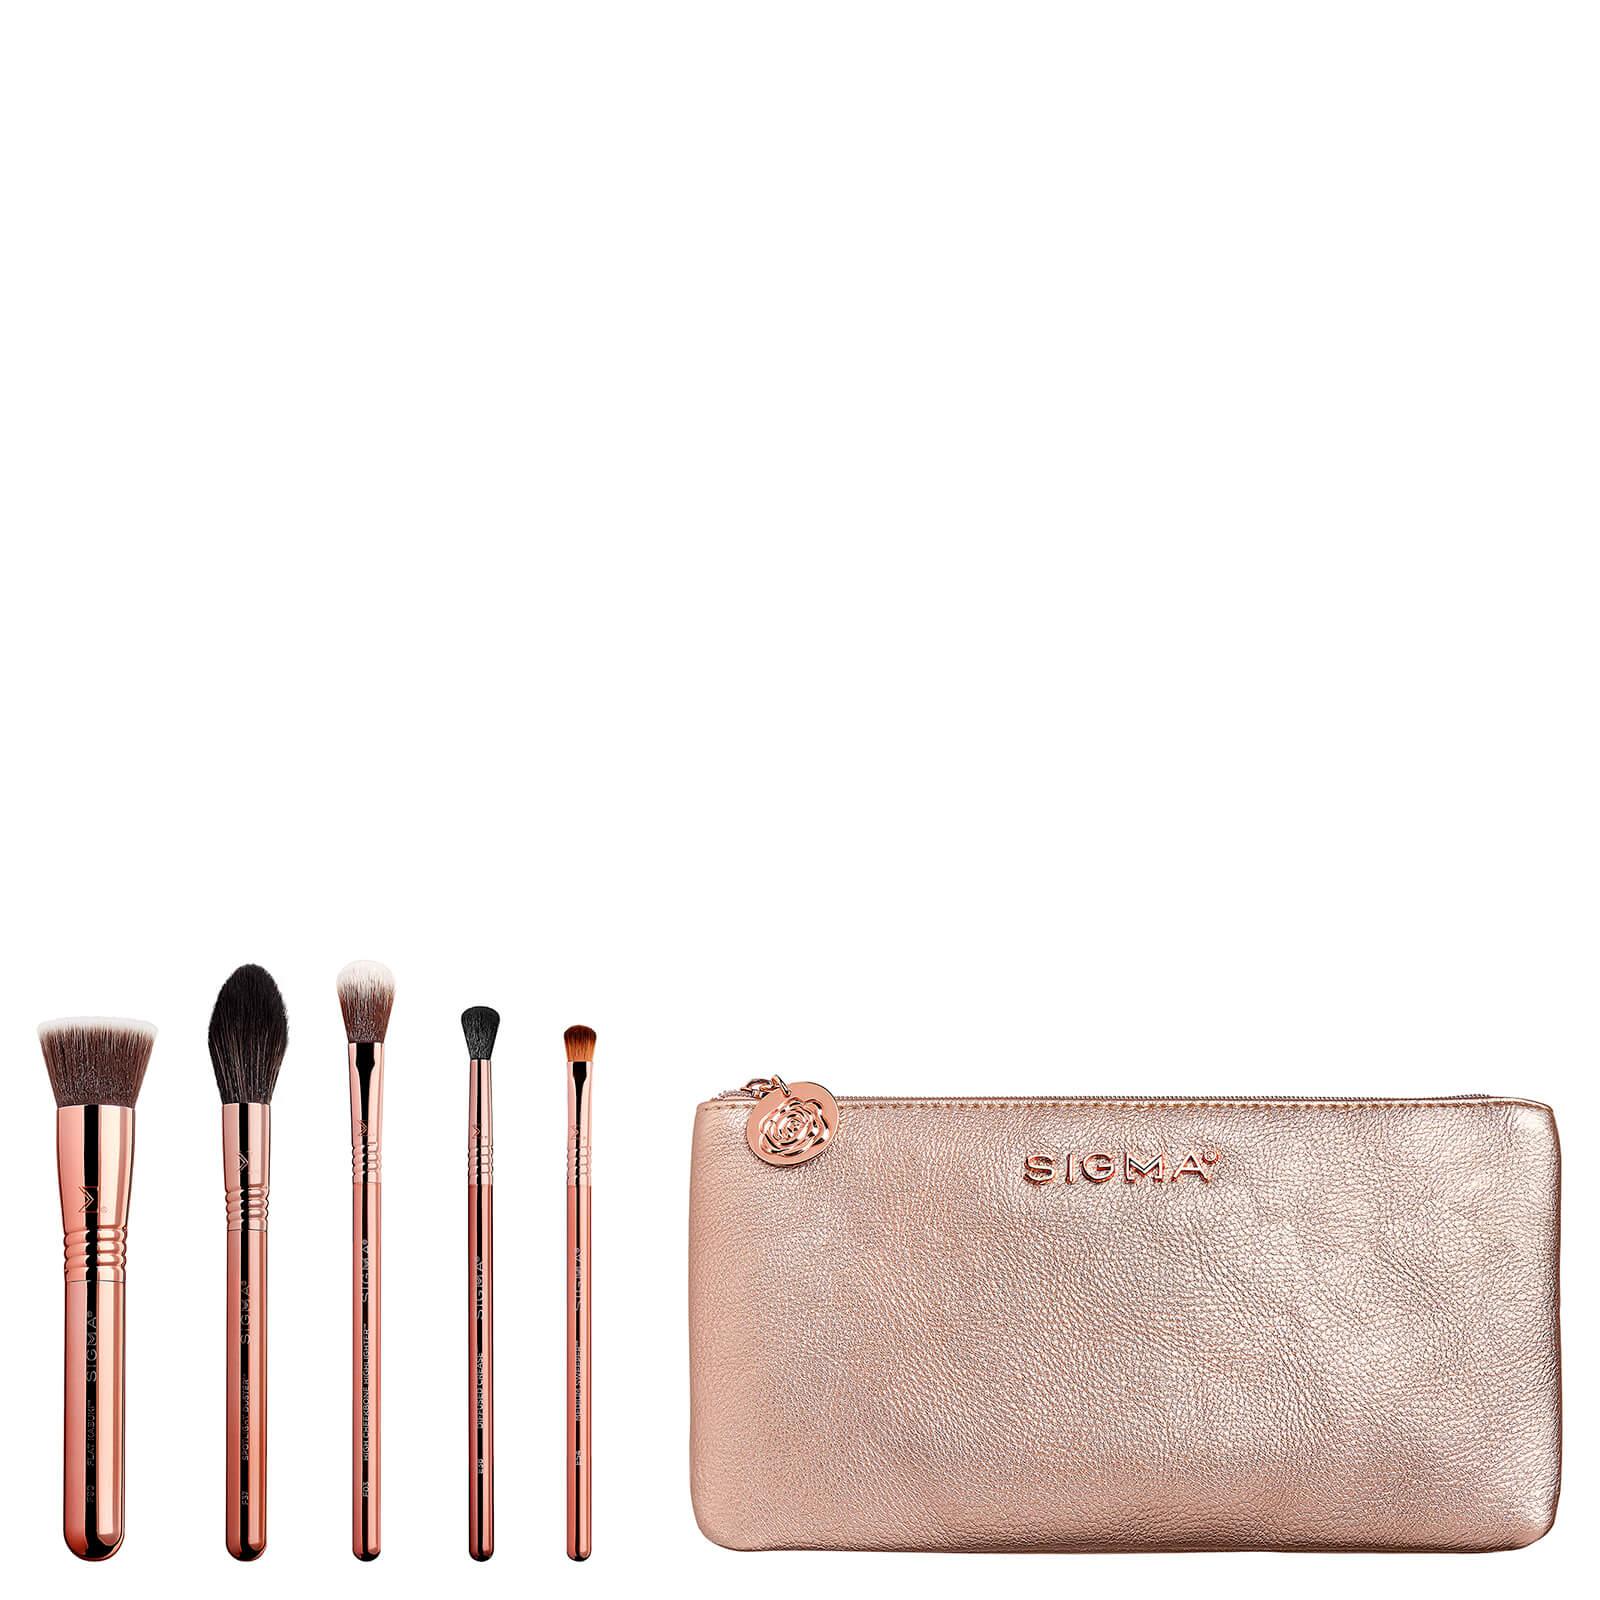 Купить Sigma Beauty Iconic Brush Set